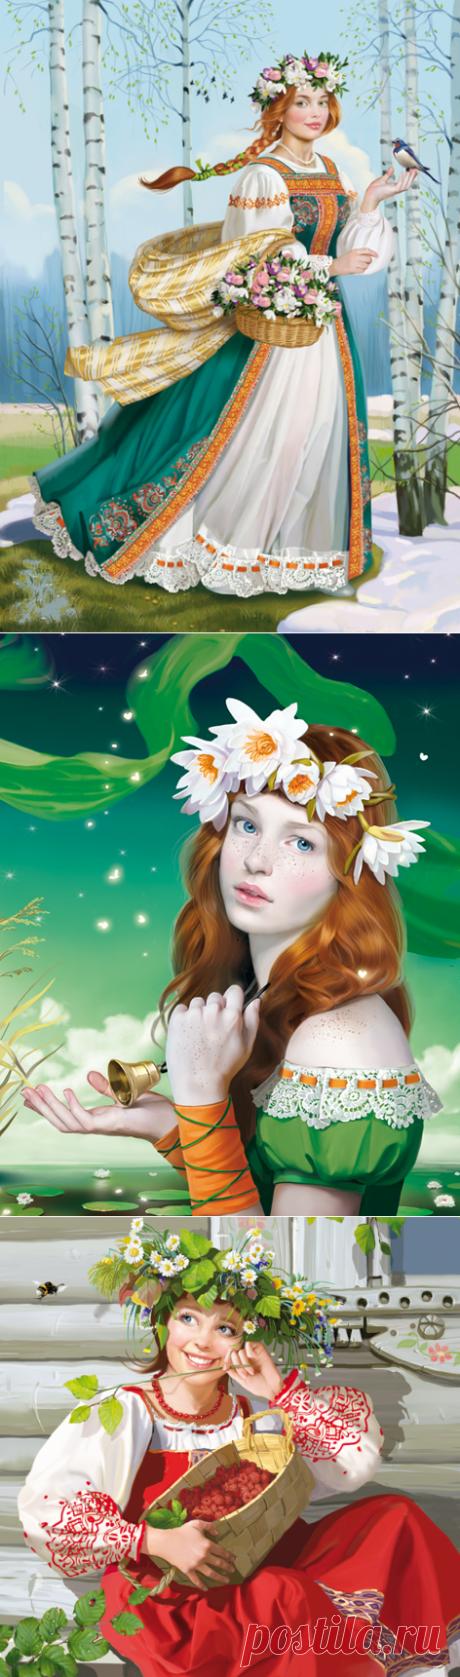 💐Прекрасна девушка Весна!... Художница Data Доронина Татьяна